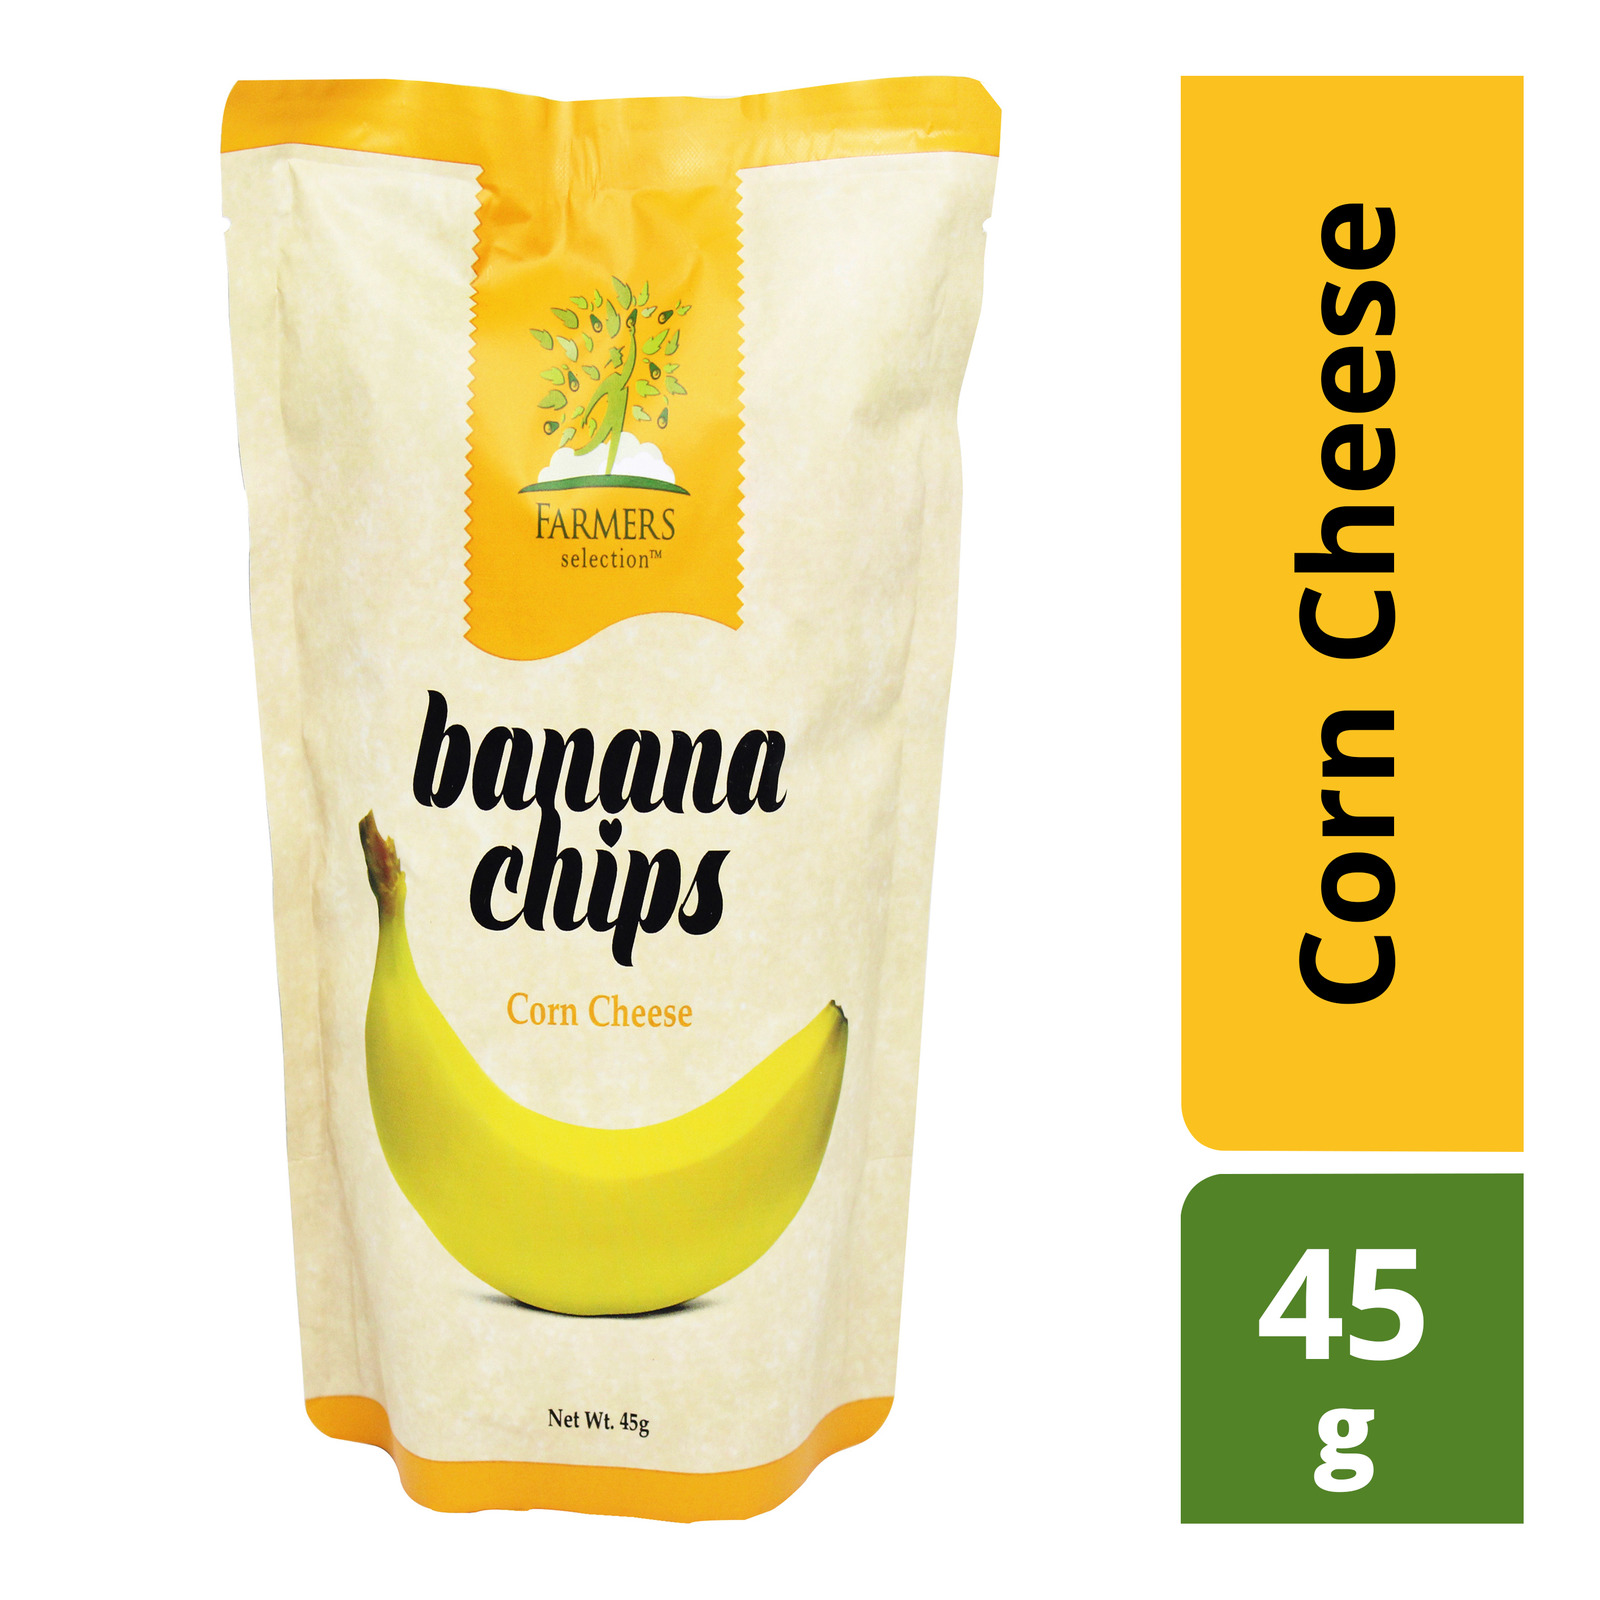 Farmers Selection Banana Chips - Corn Cheese